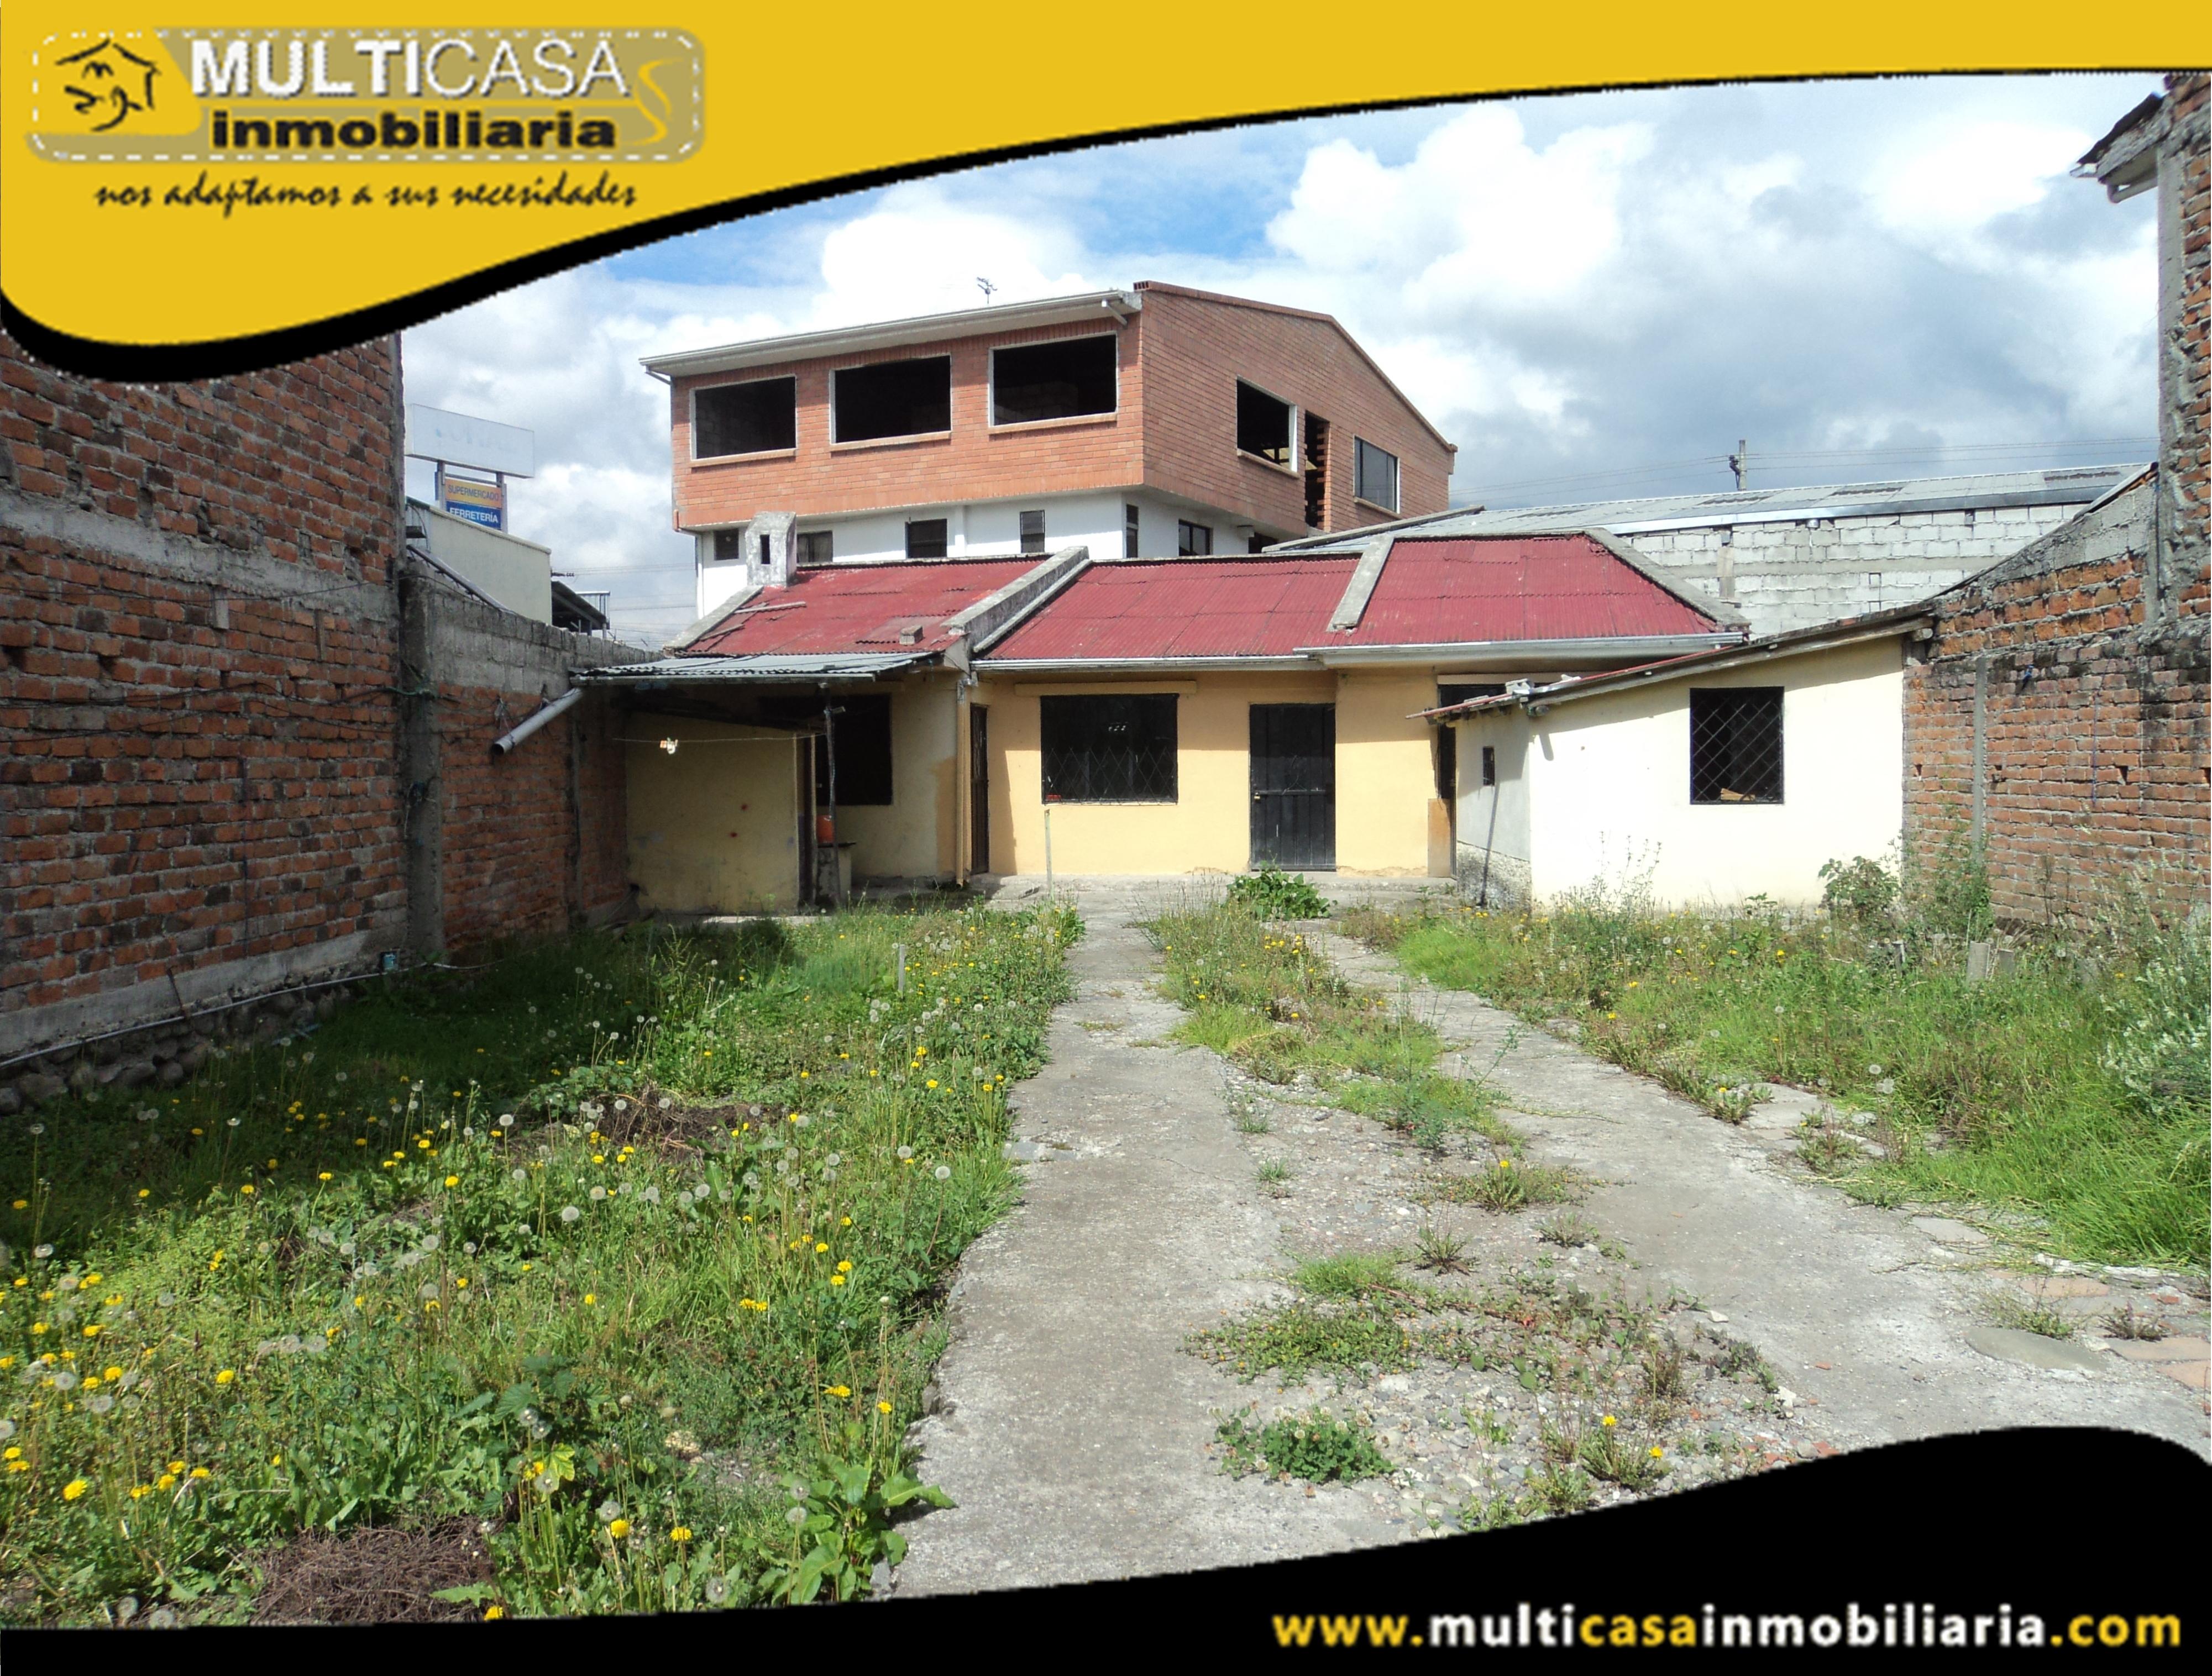 Sitio con Casa en Venta a Crédito Sector Coral Centro Cuenca-Ecuador